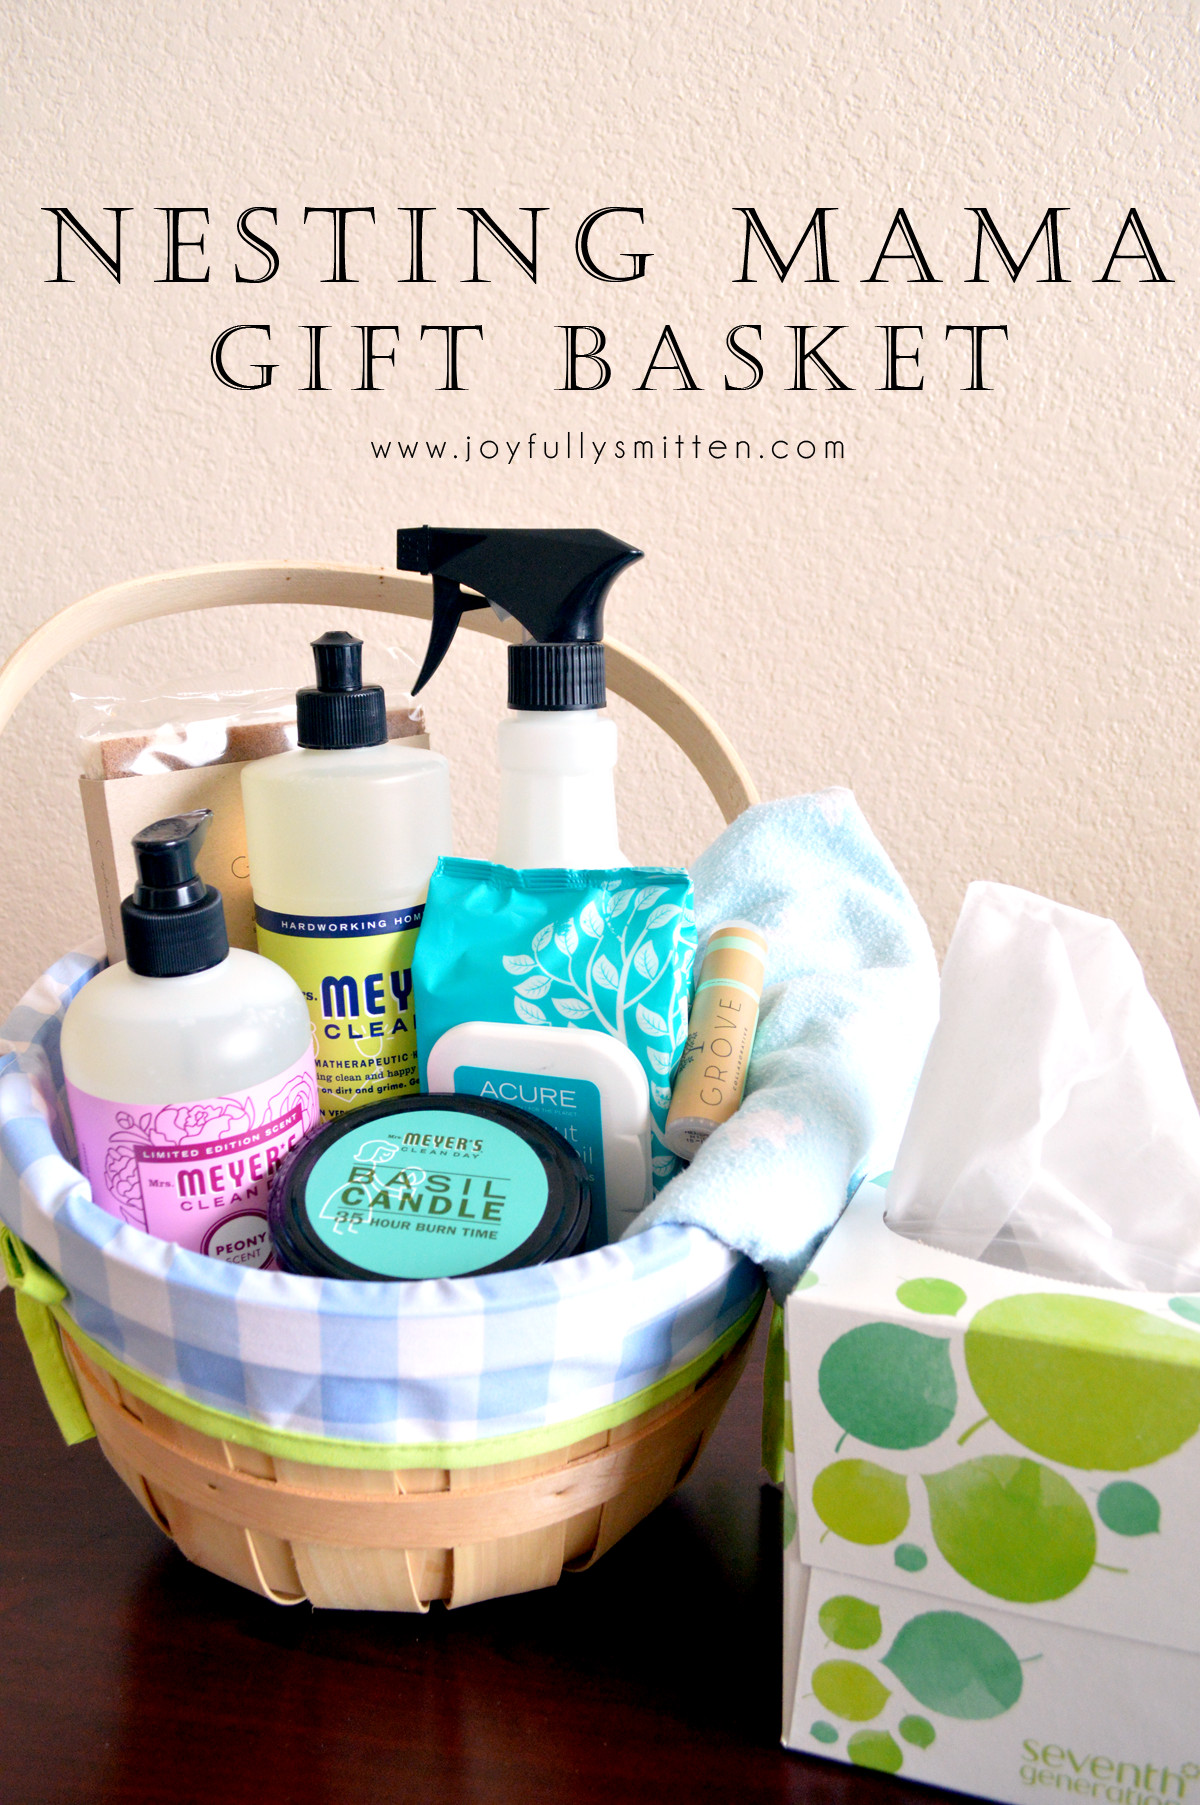 Gift Ideas For Expecting Mother  DIY Nesting Mama Gift Basket Joyfully Smitten